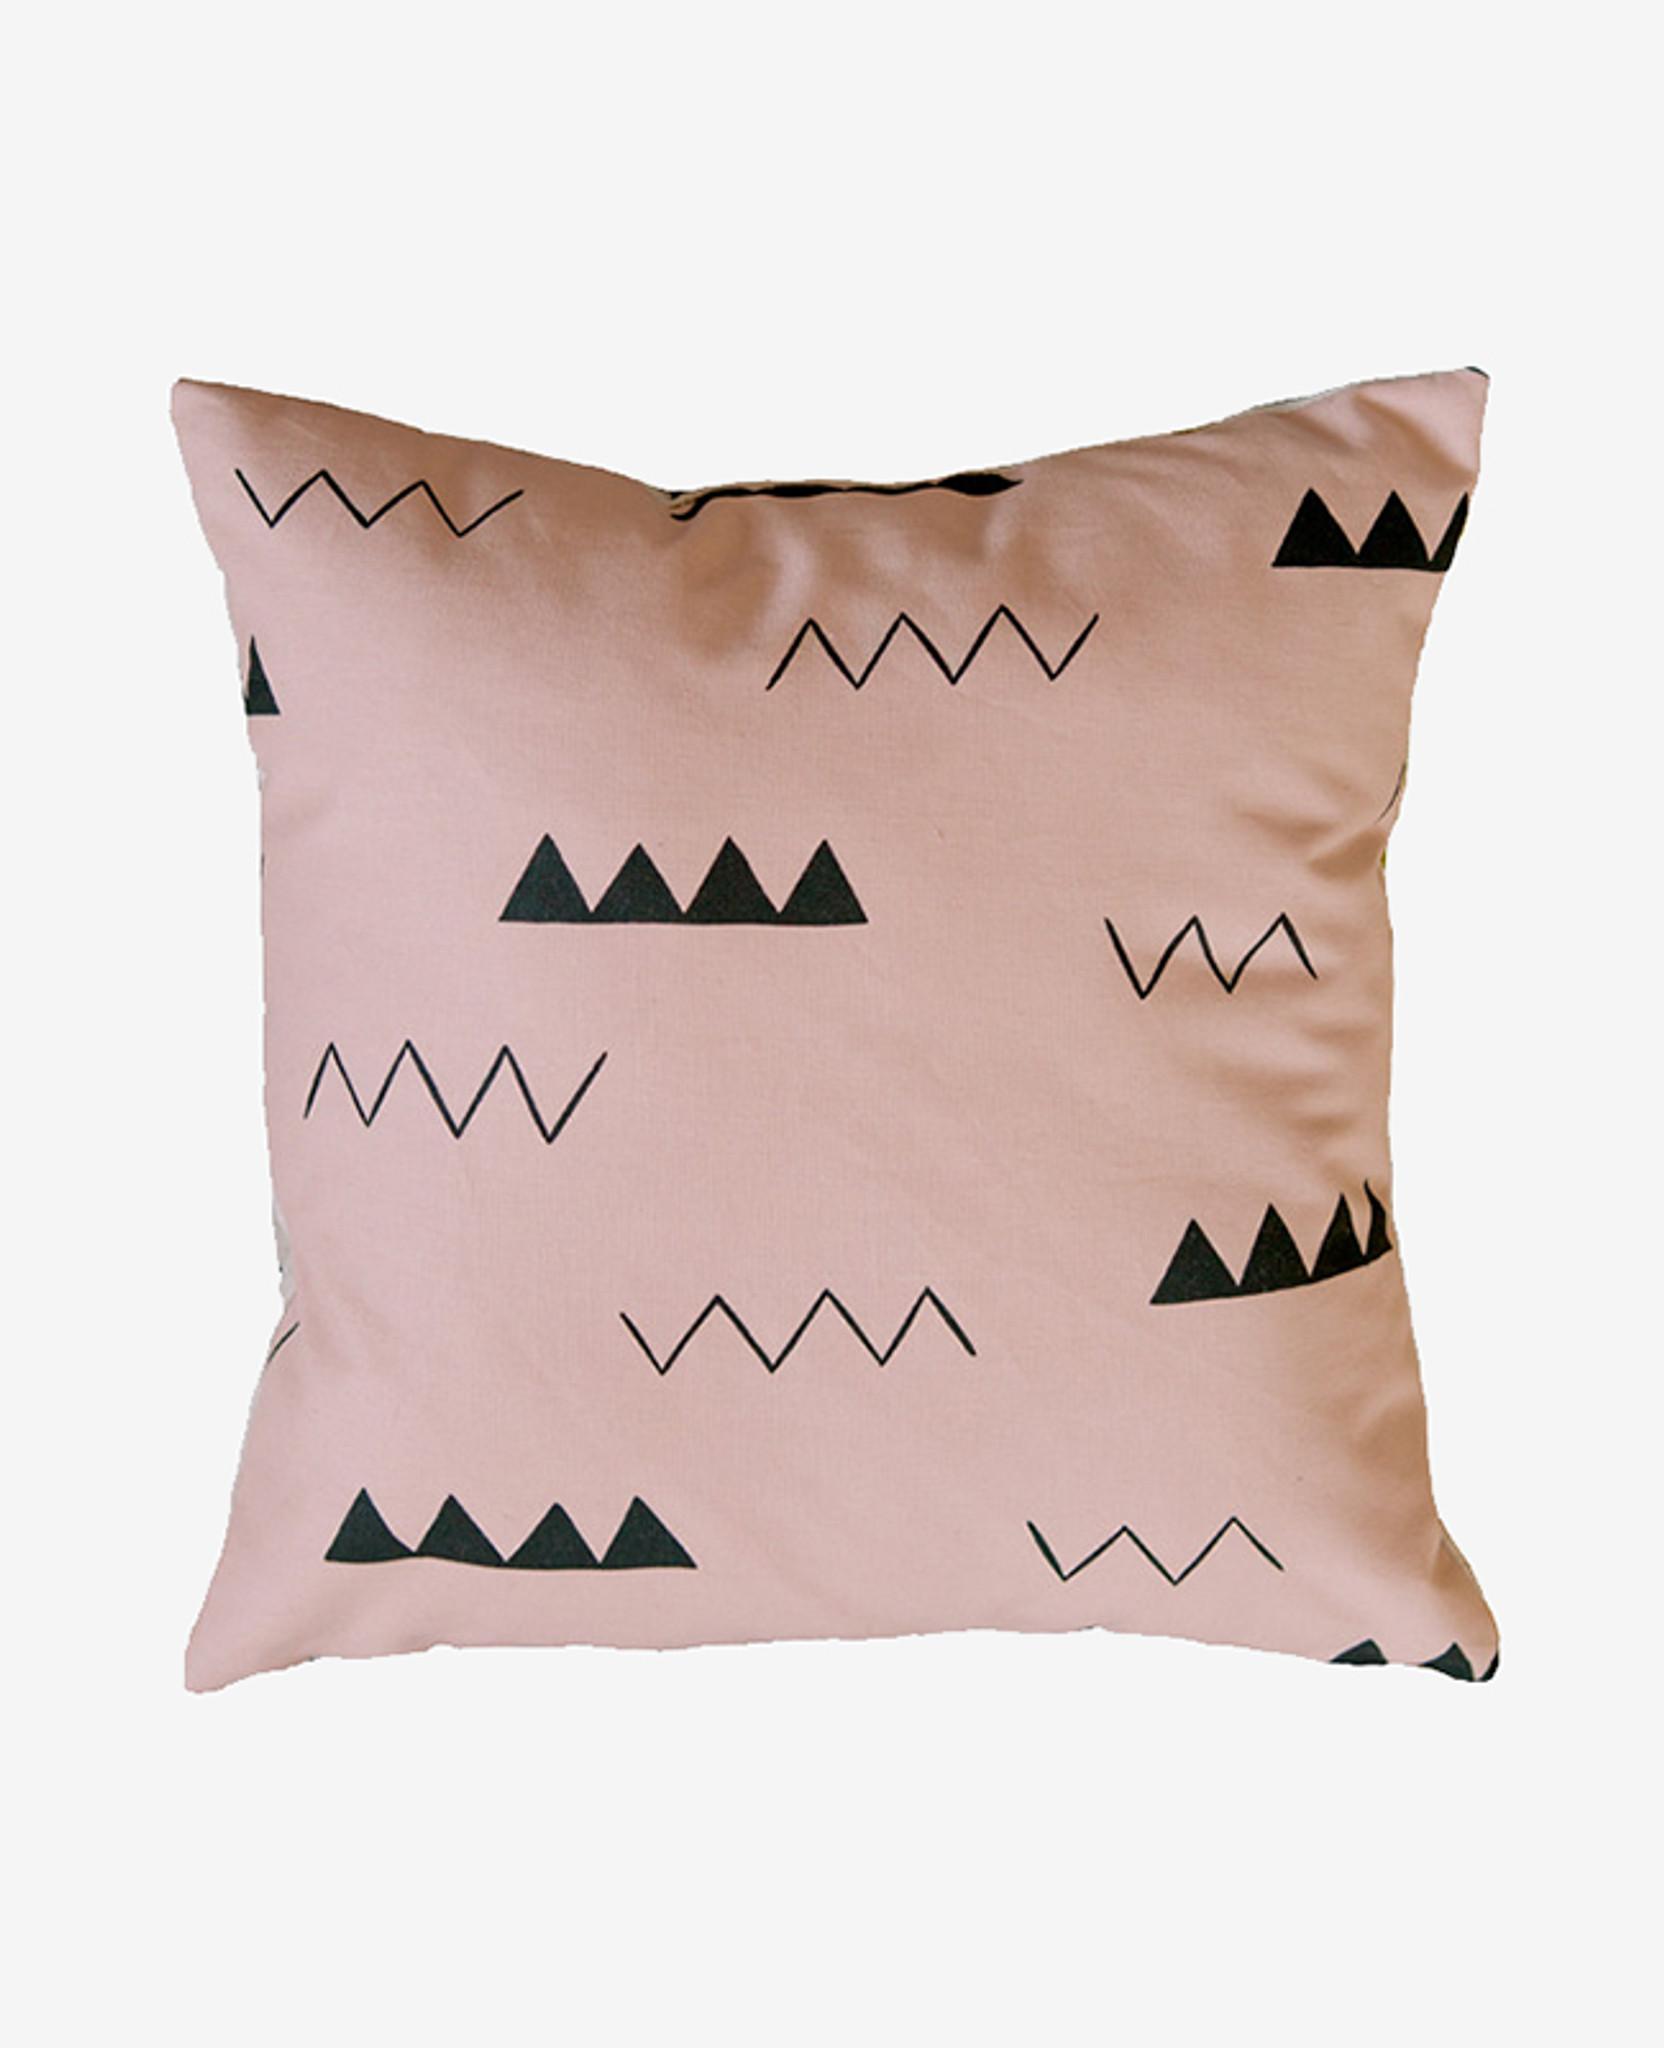 Blush Pink Zig Zag Pillow